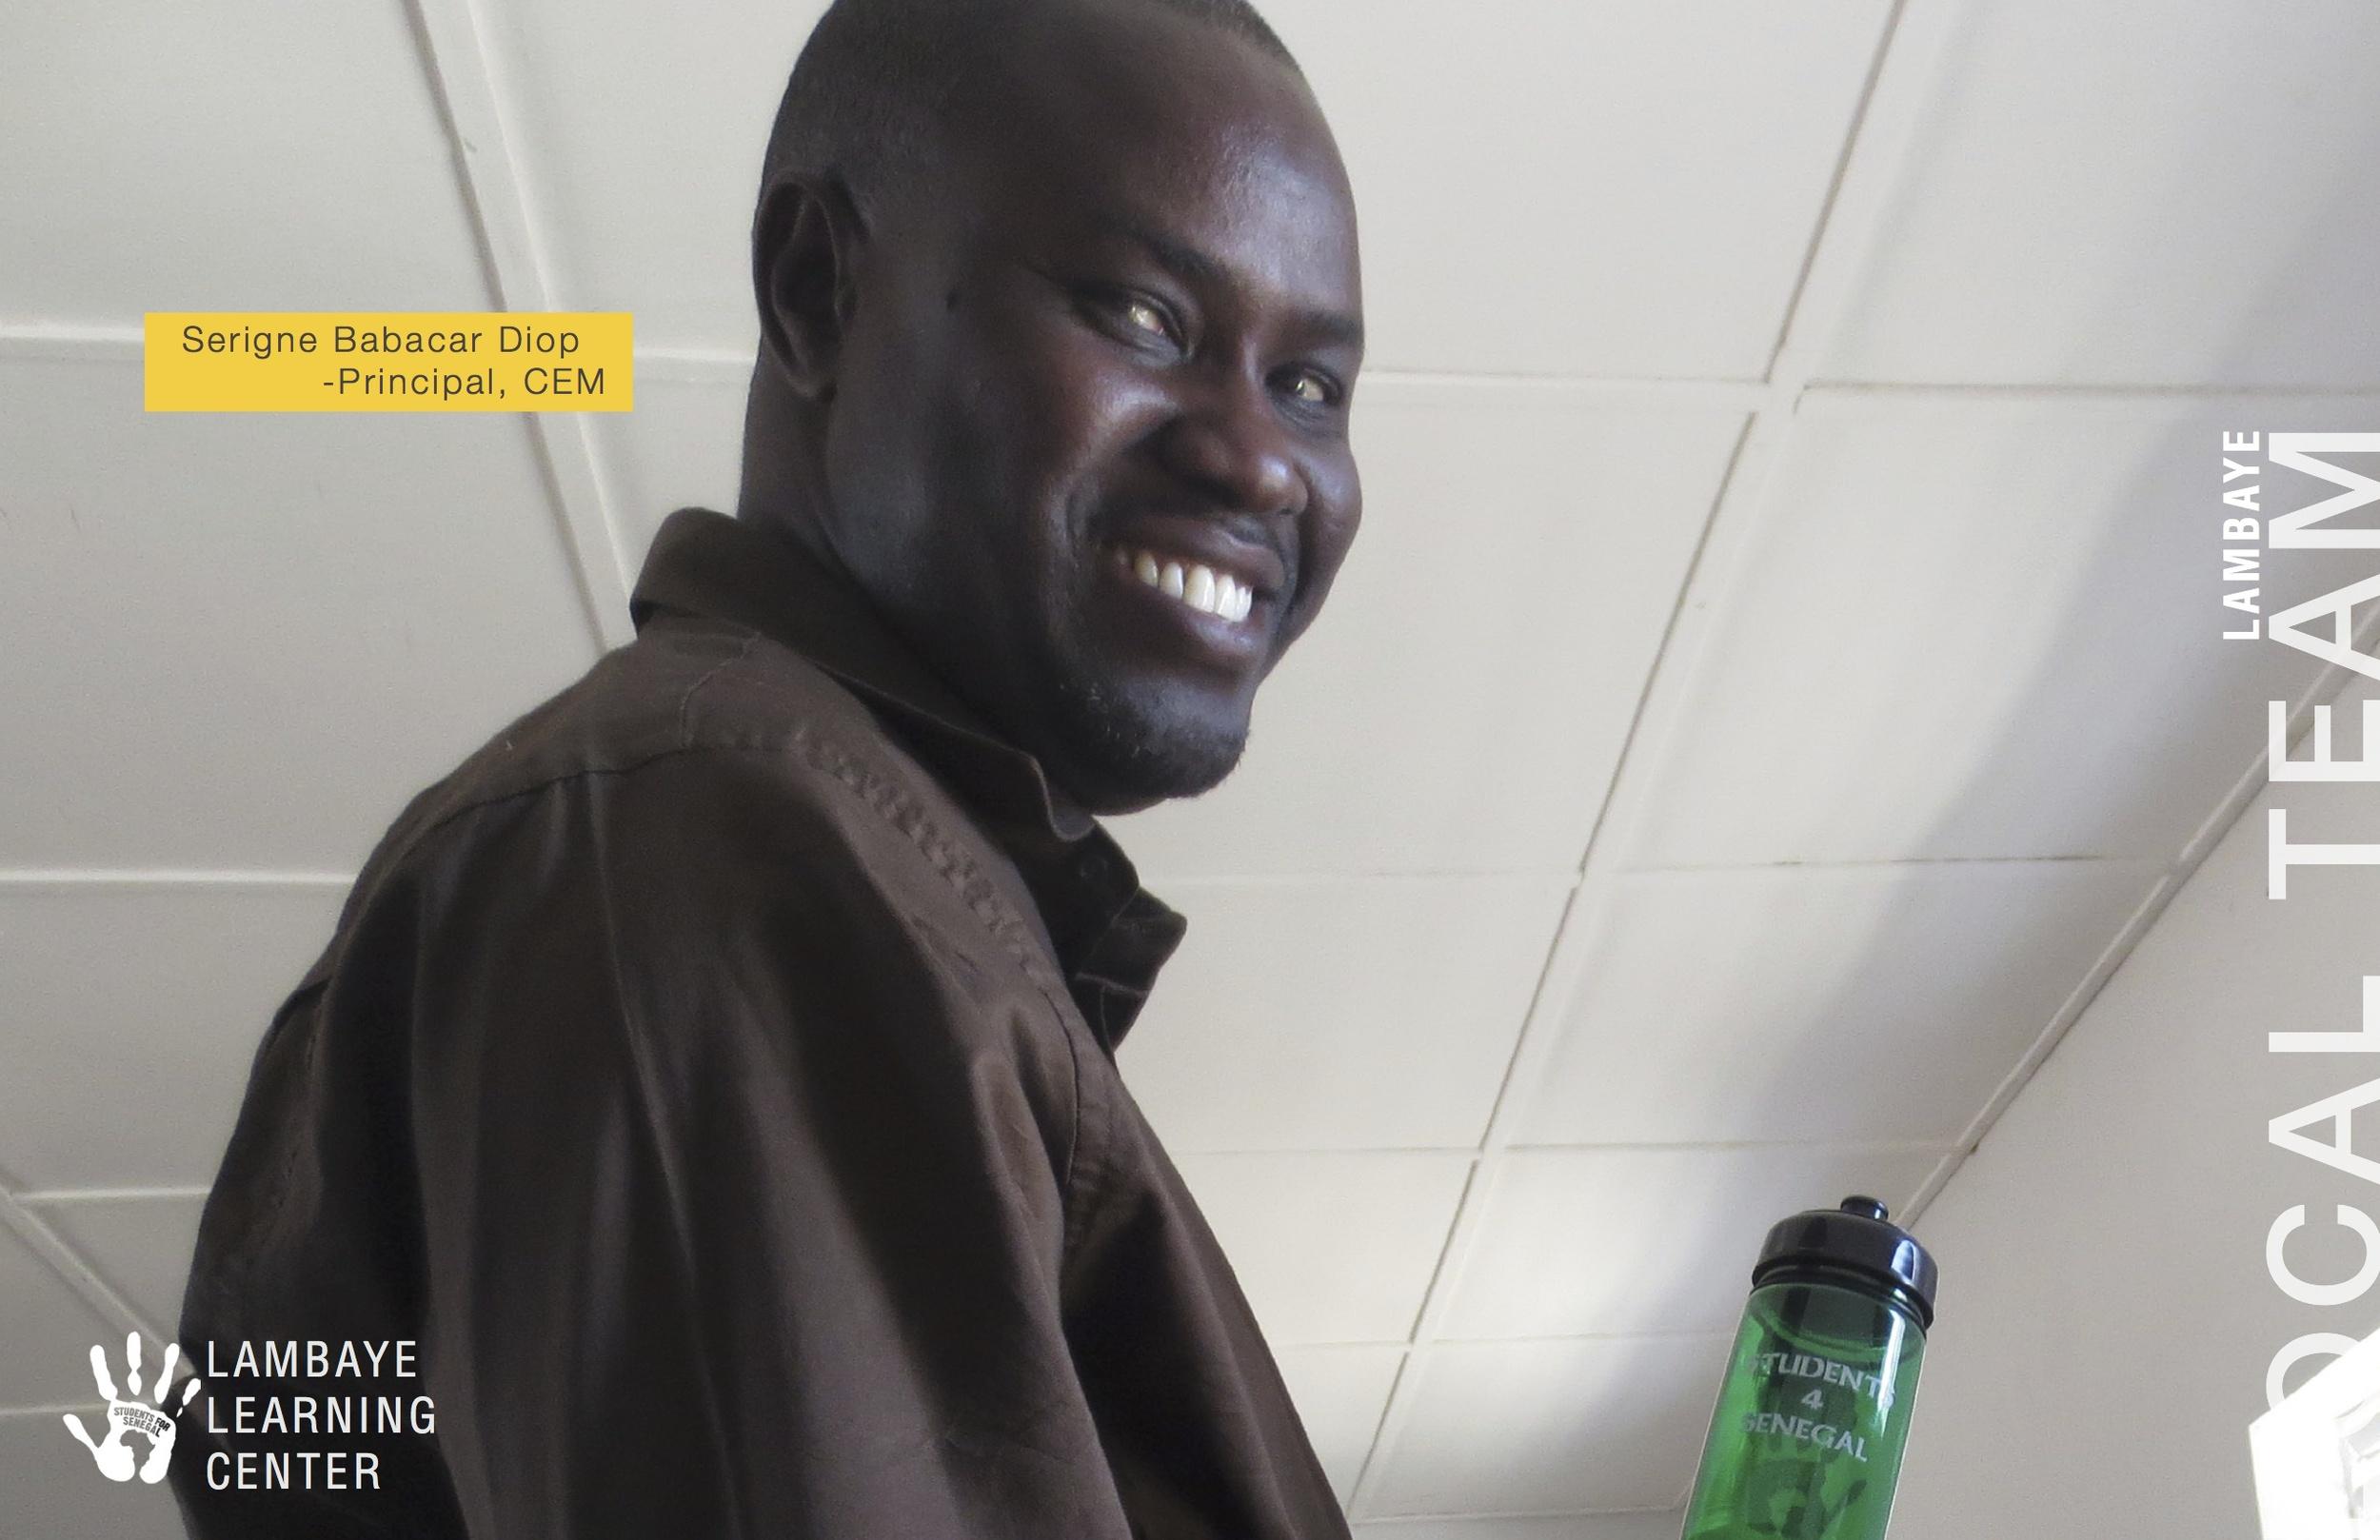 Serigne Babacar Diop - Principal, CEM